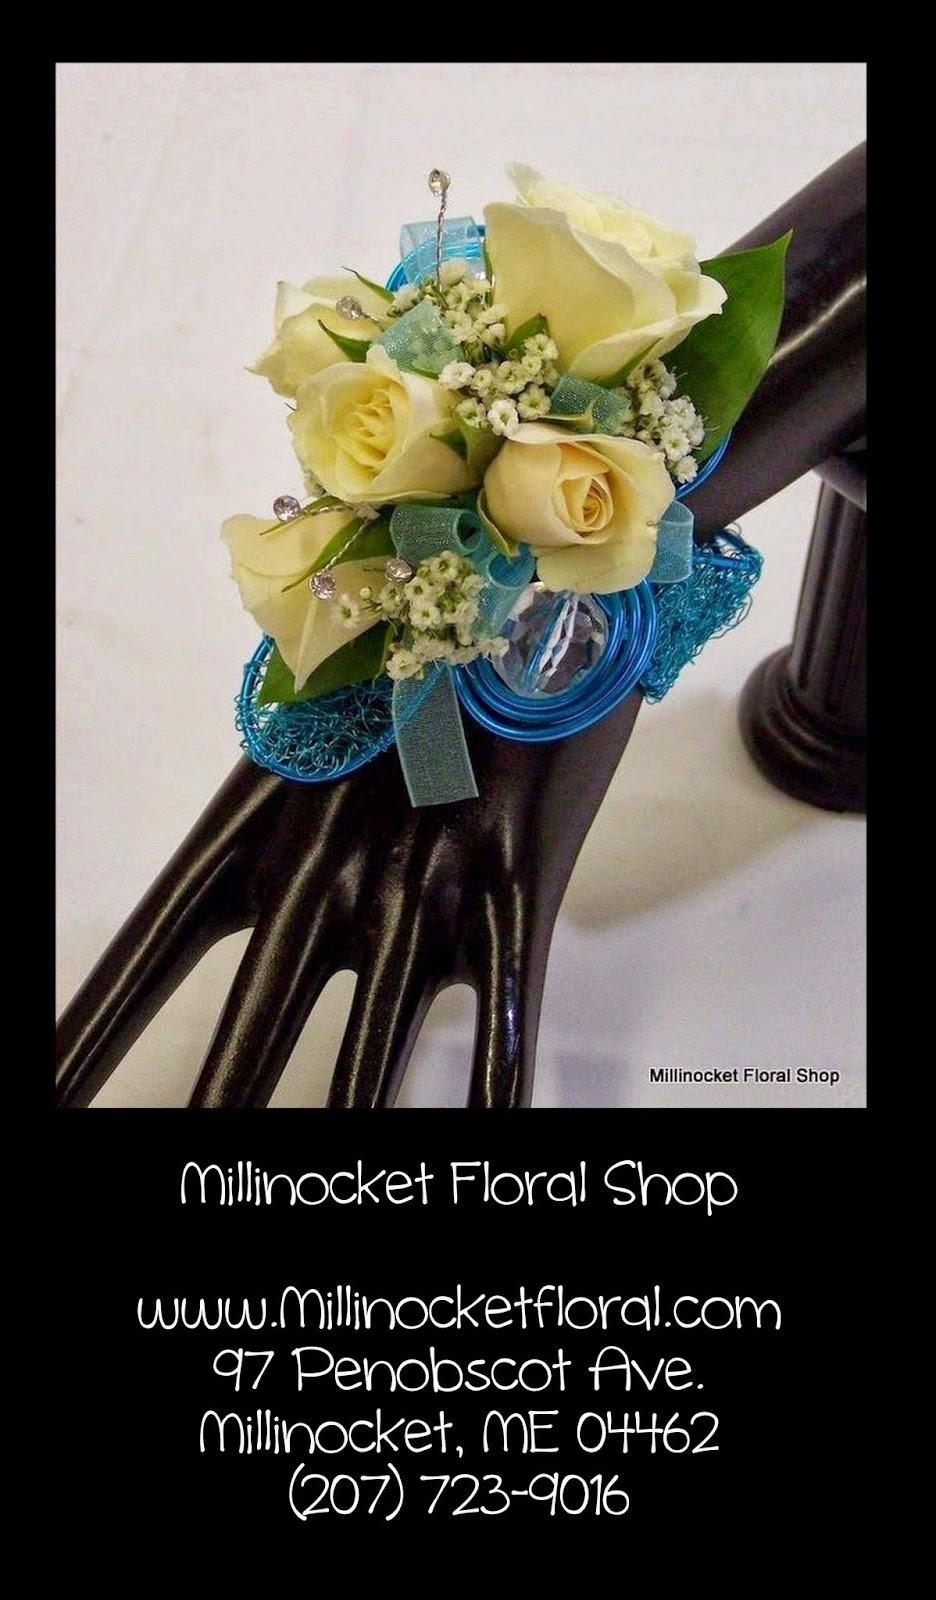 http://www.millinocketfloral.com/